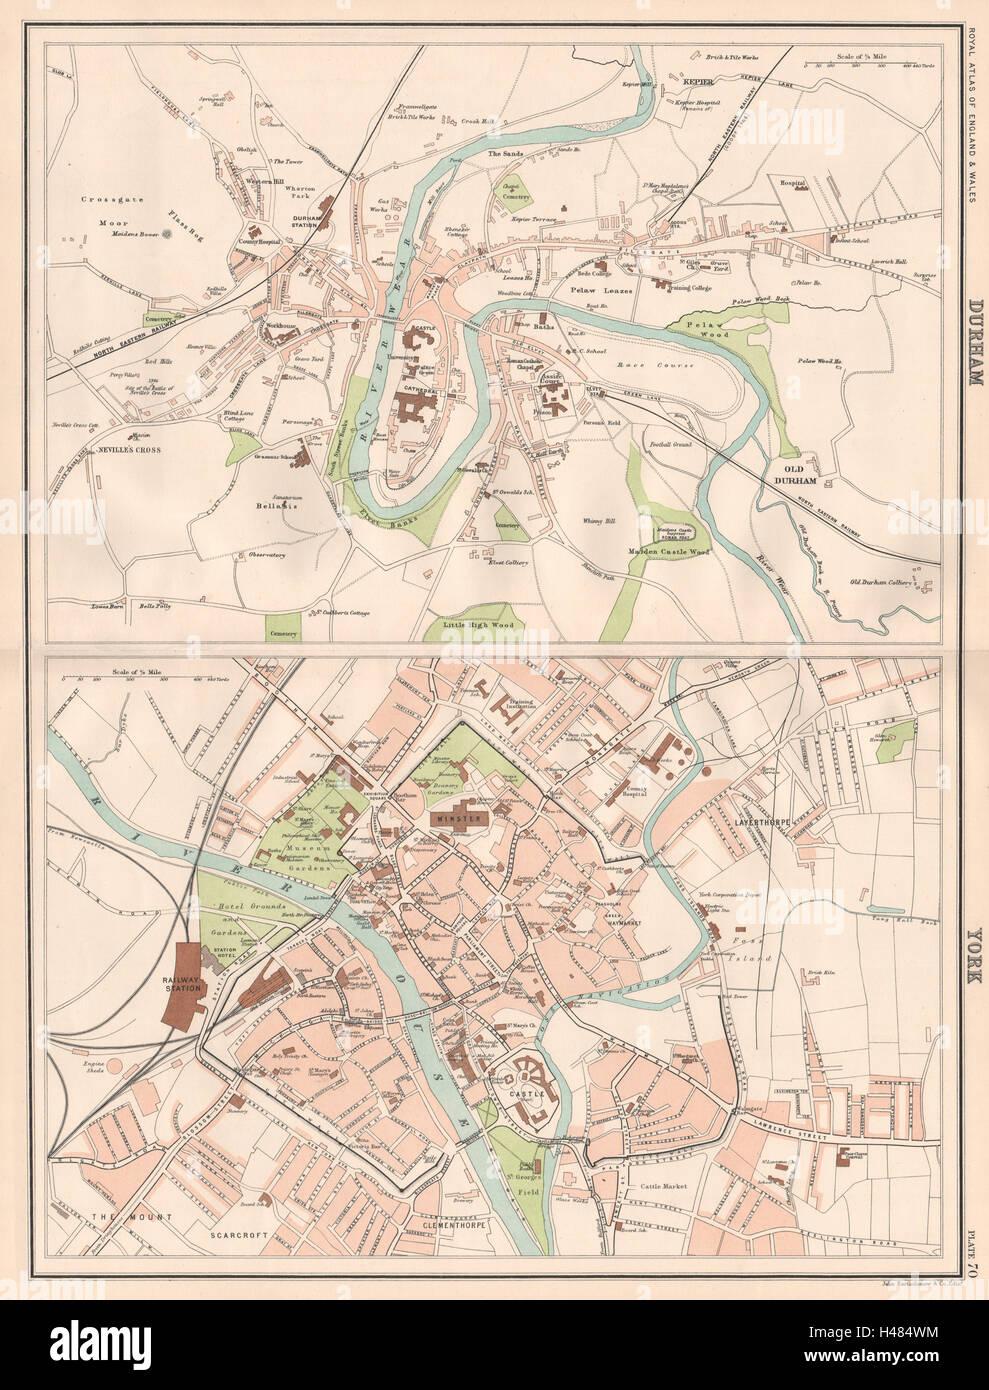 Durham York Antique Town City Plans Bartholomew 1898 Old Map